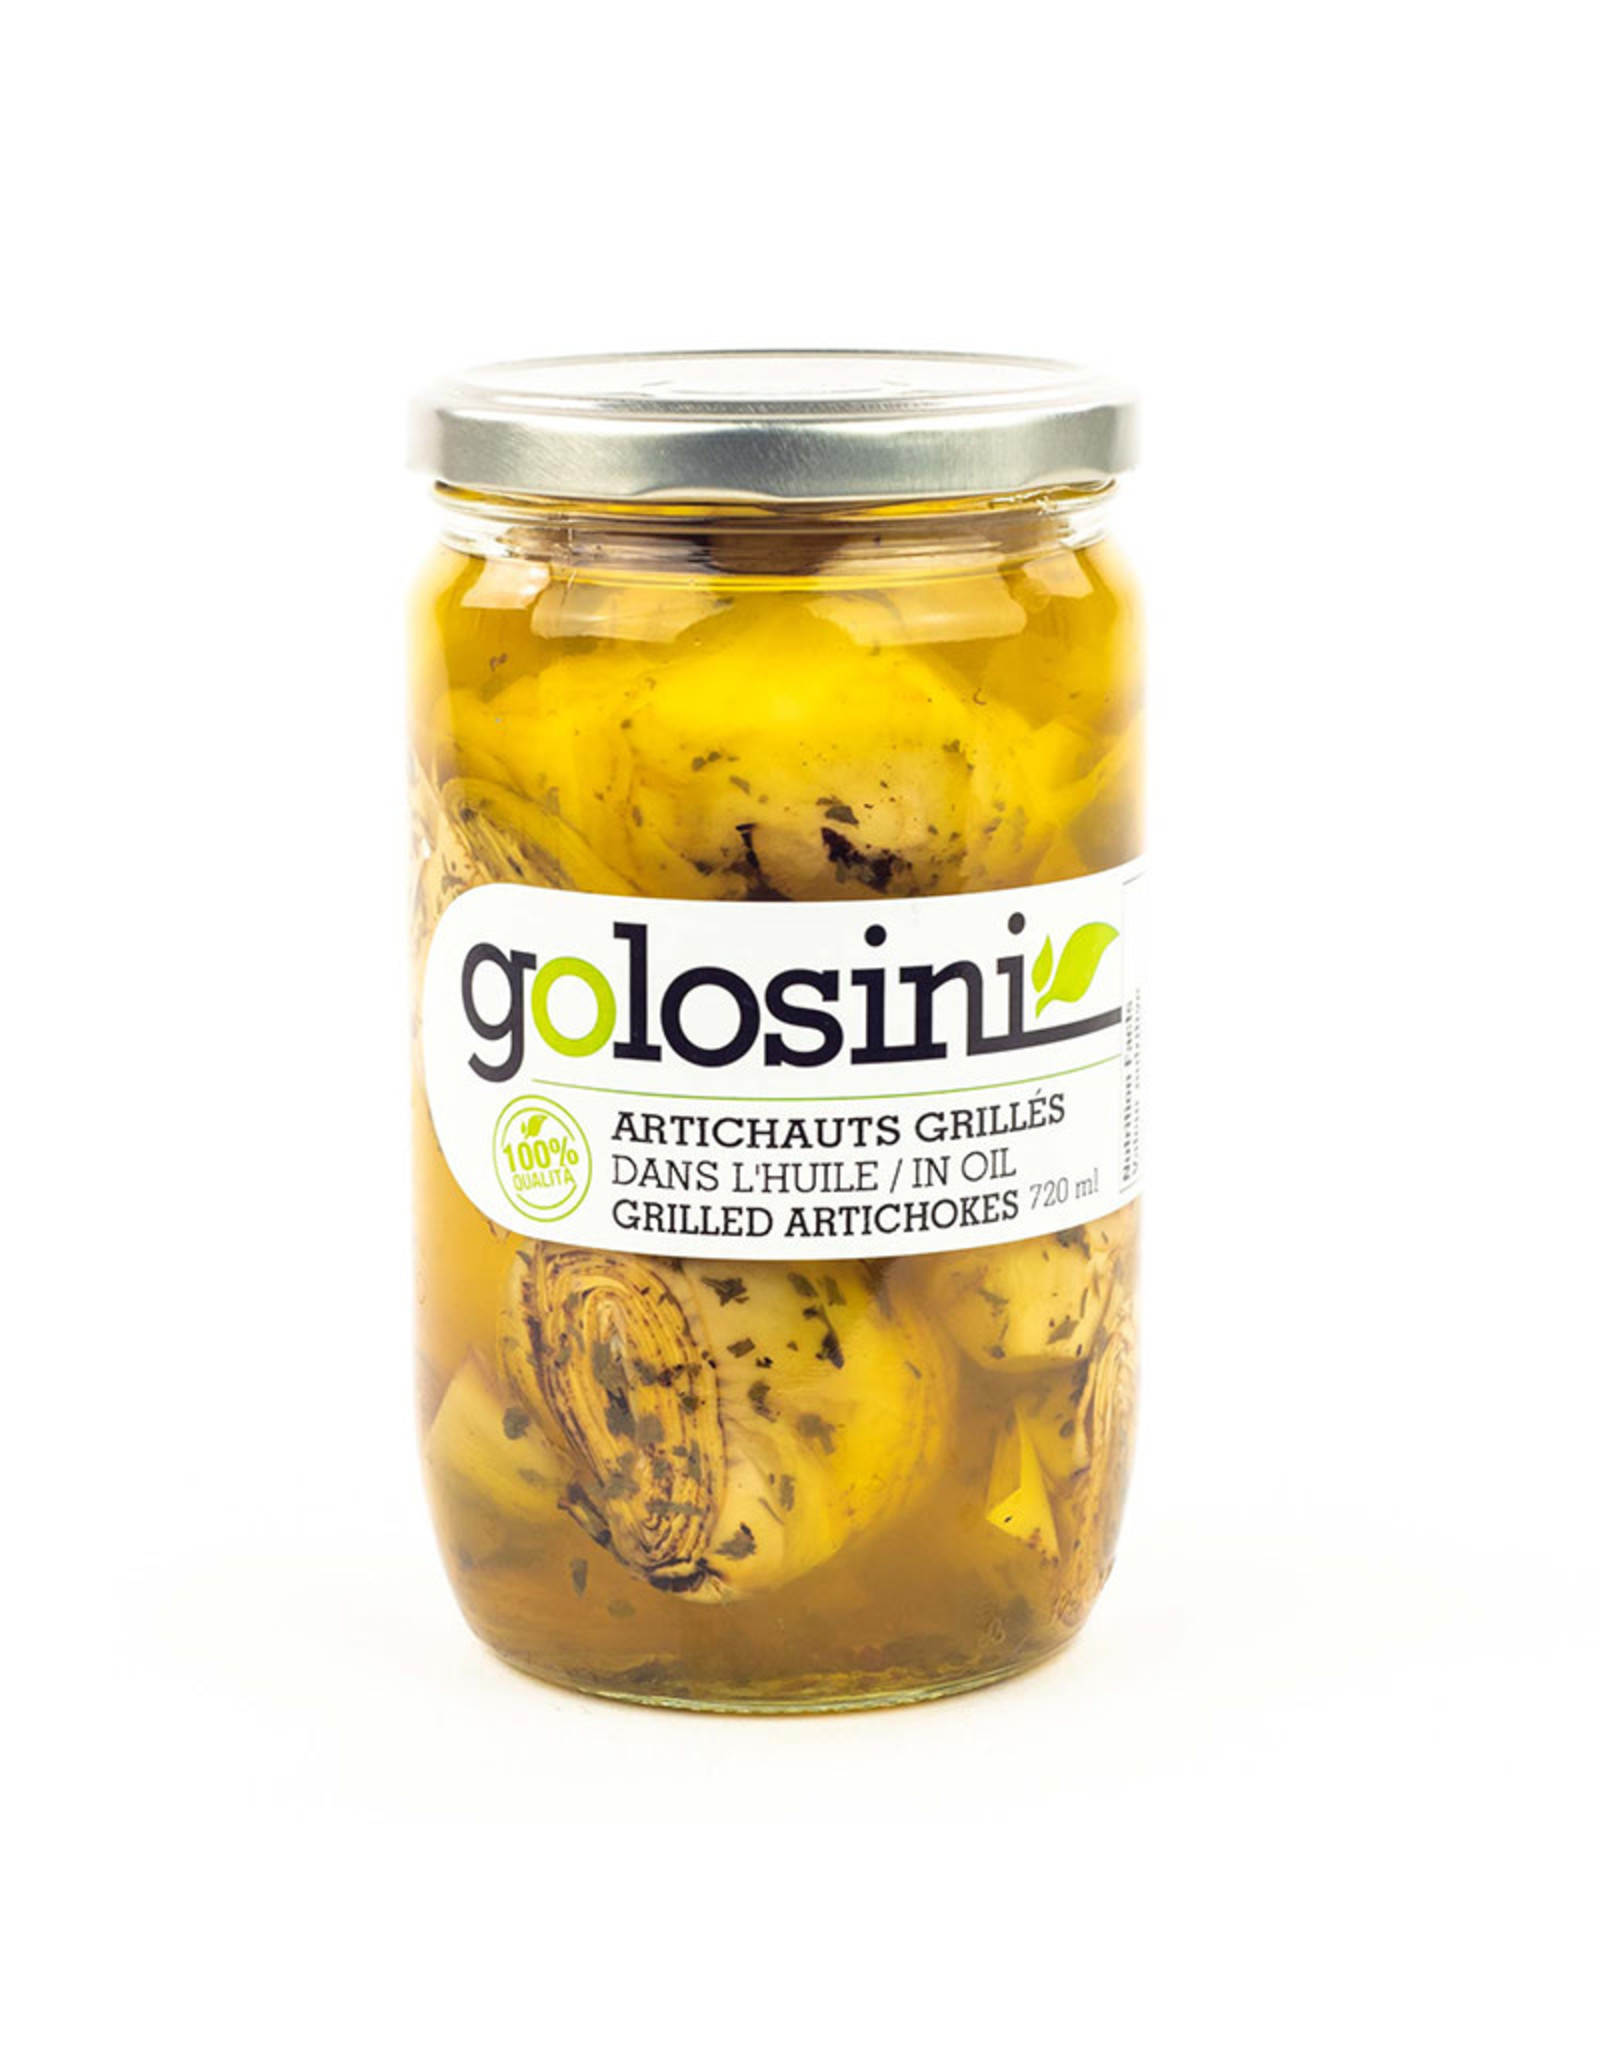 Golosini Golosini - Grilled Artichokes (720ml)